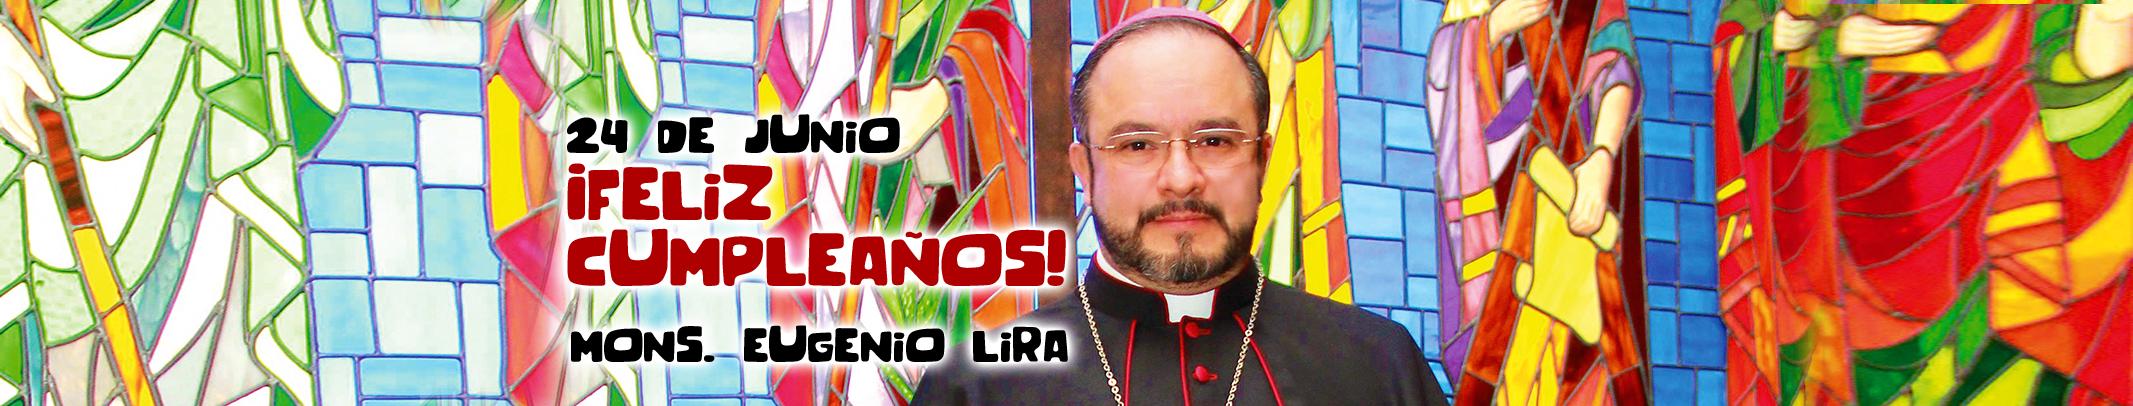 banderola-obispo-cvmple